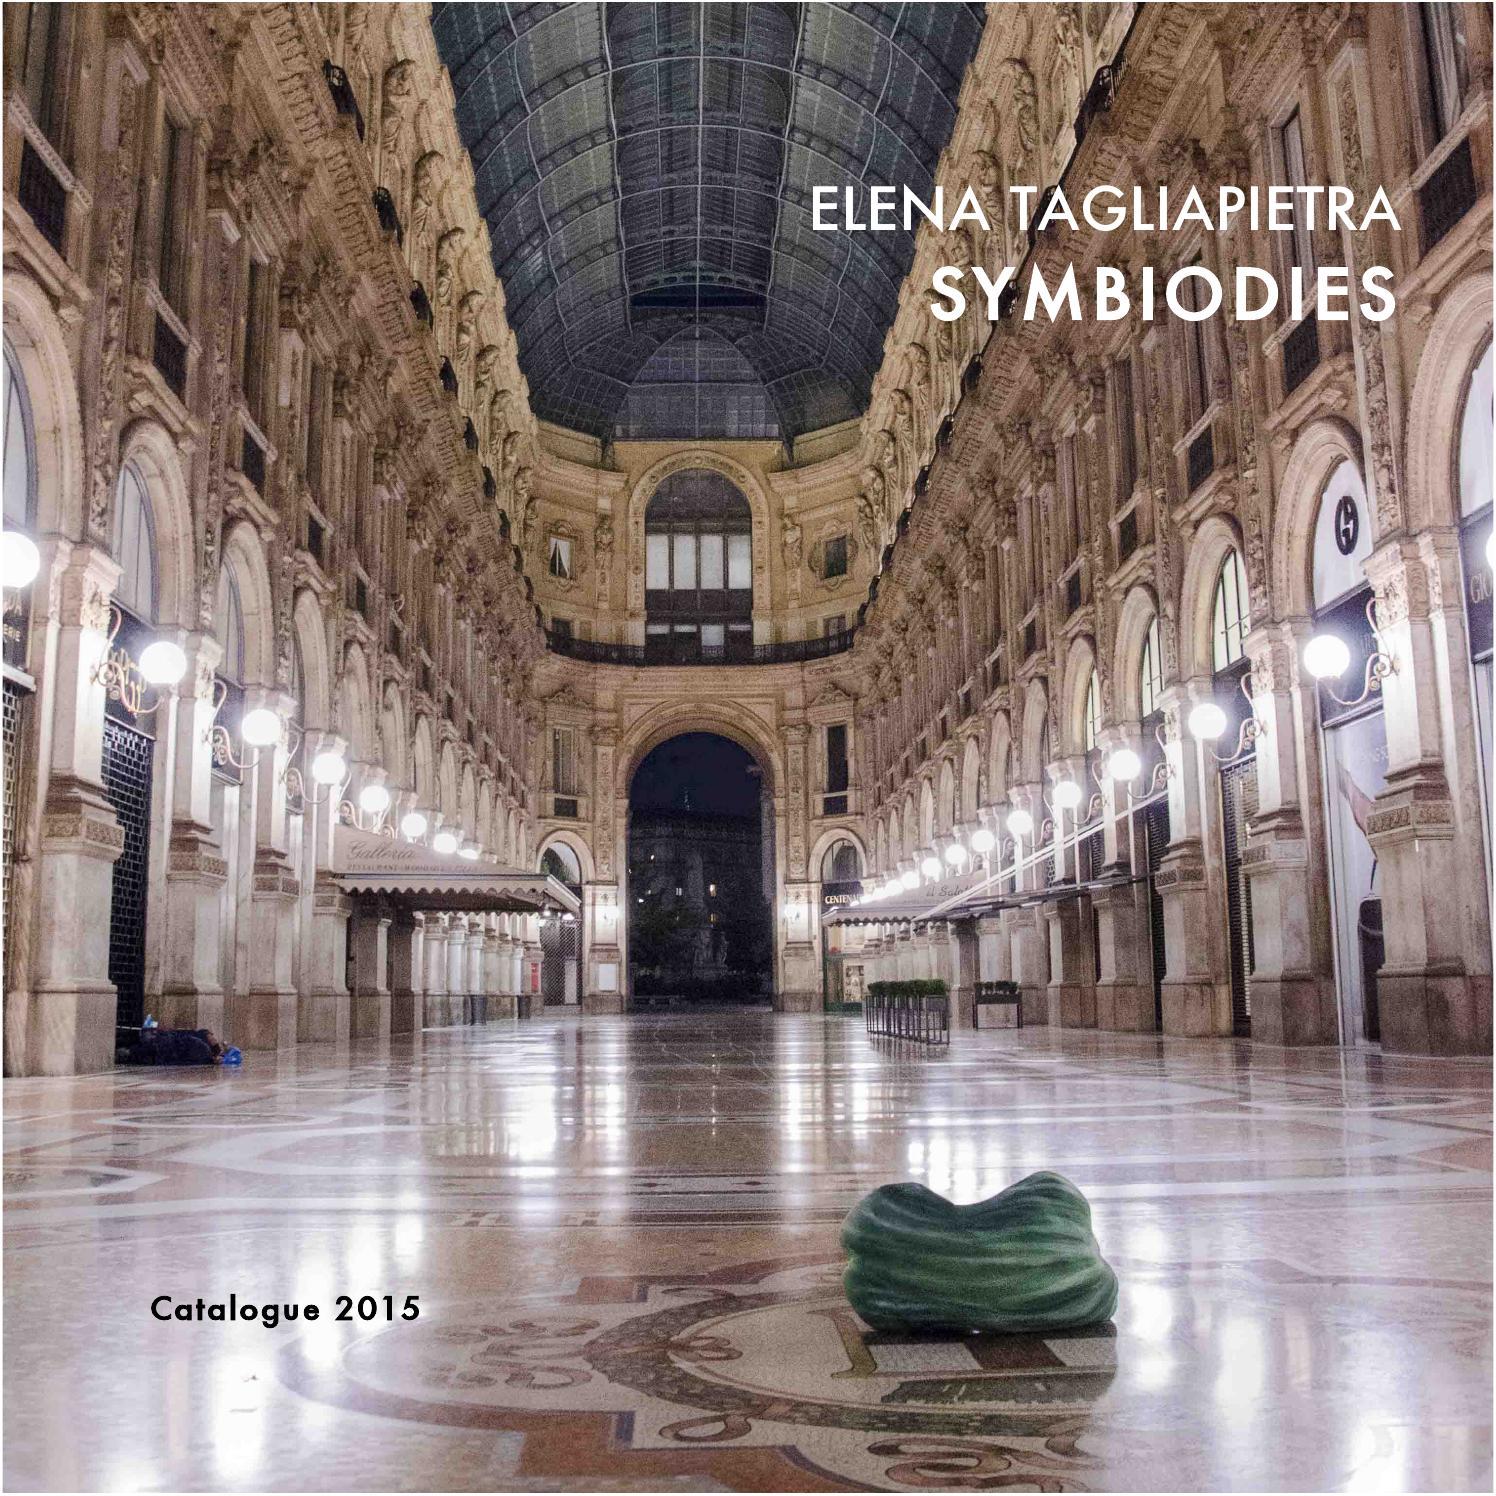 Merlino Bottega D Arte symbiodies project - catalogue 2015 by elena tagliapietra